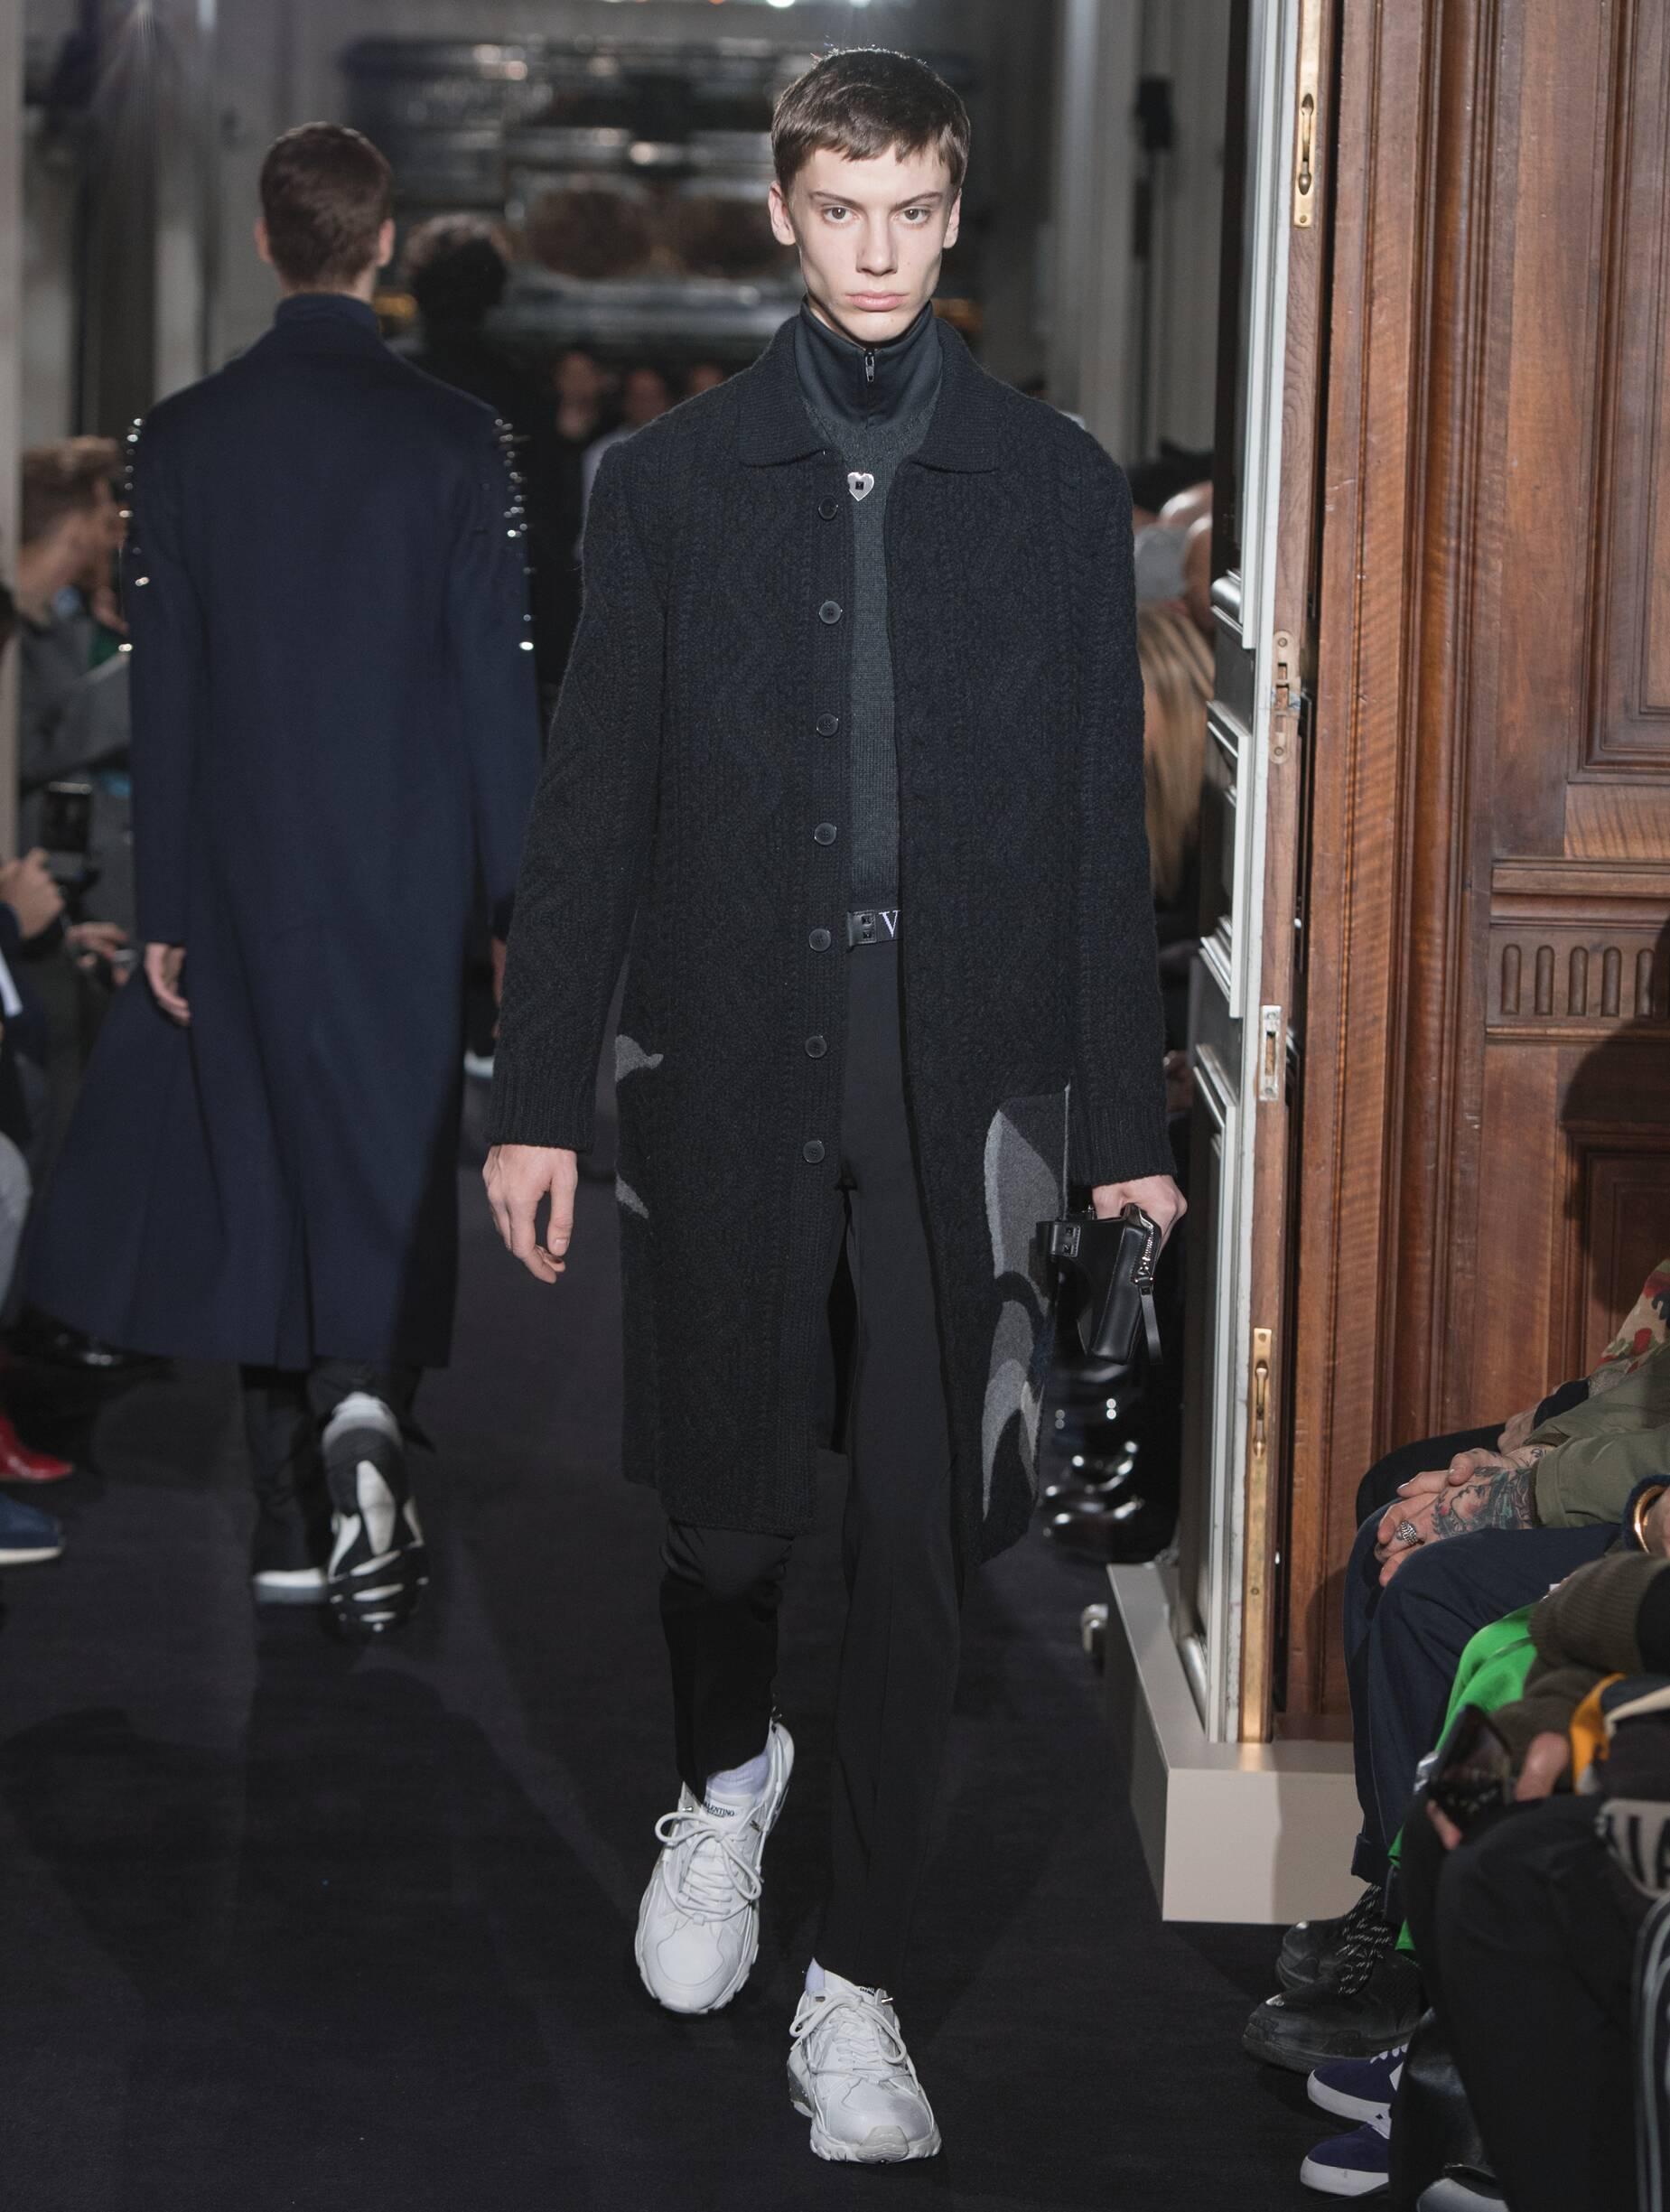 Man FW 2018-19 Fashion Show Valentino